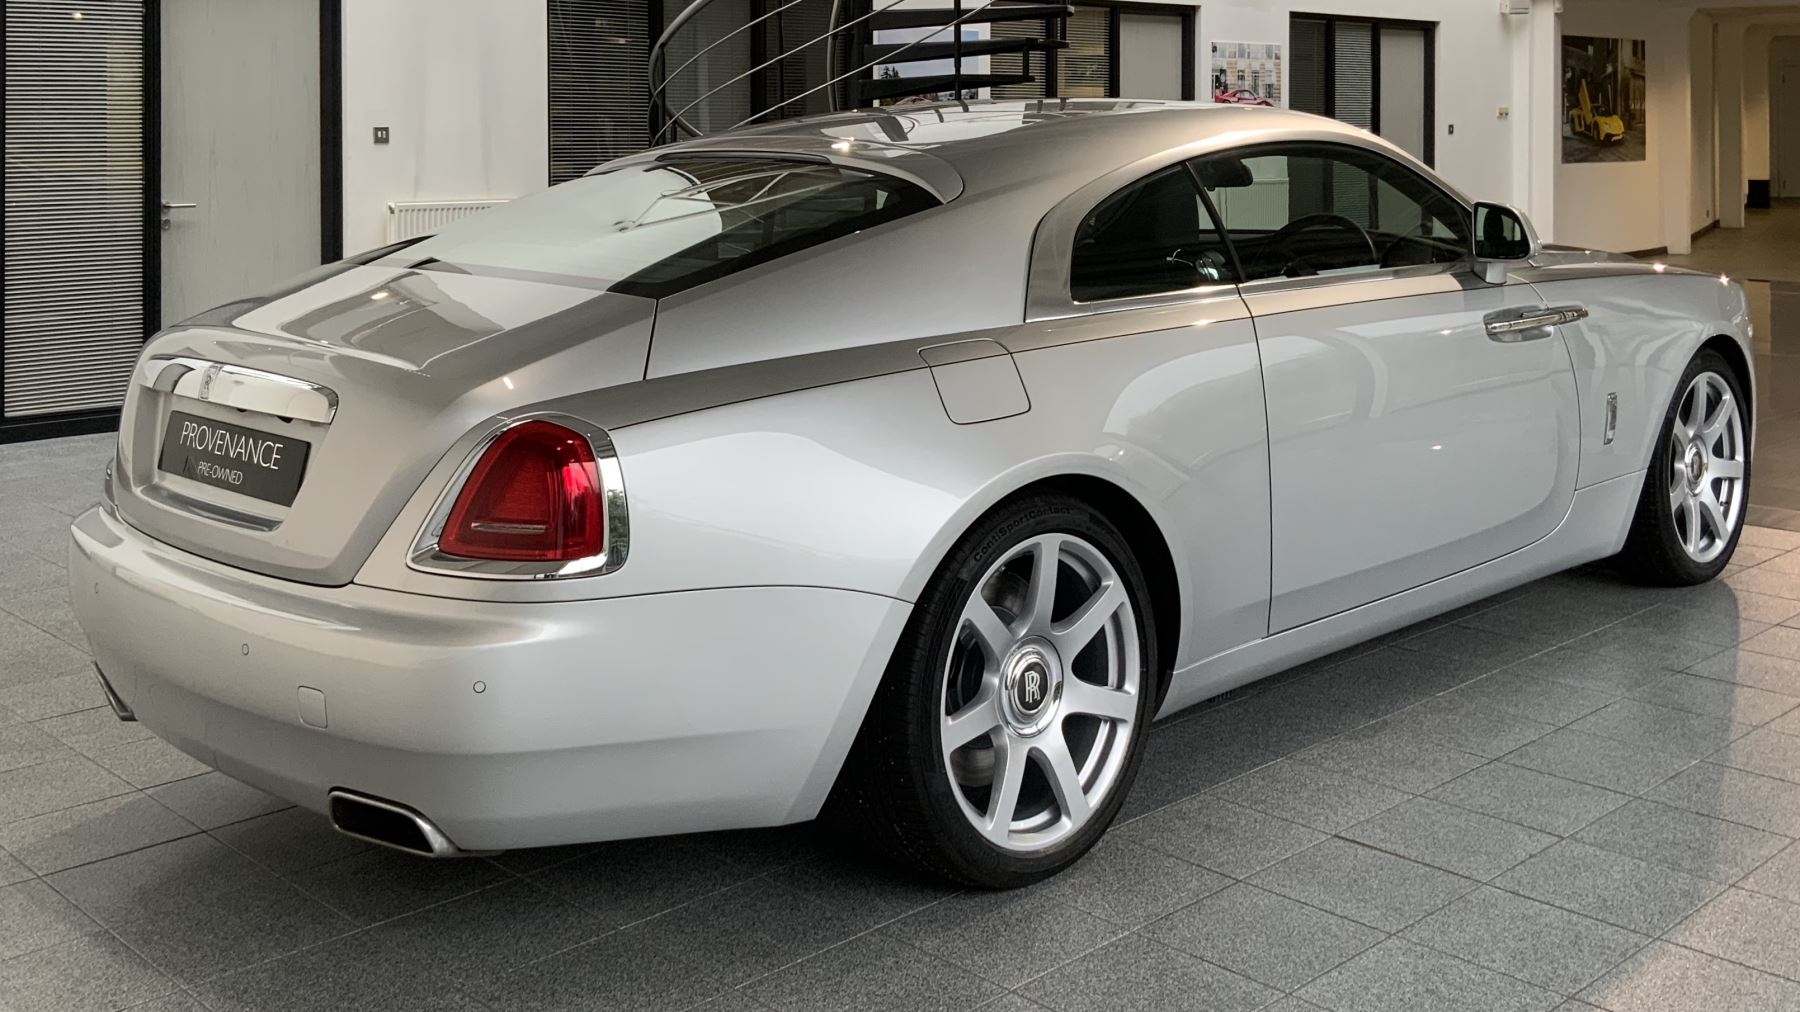 Rolls-Royce Wraith V12 image 3